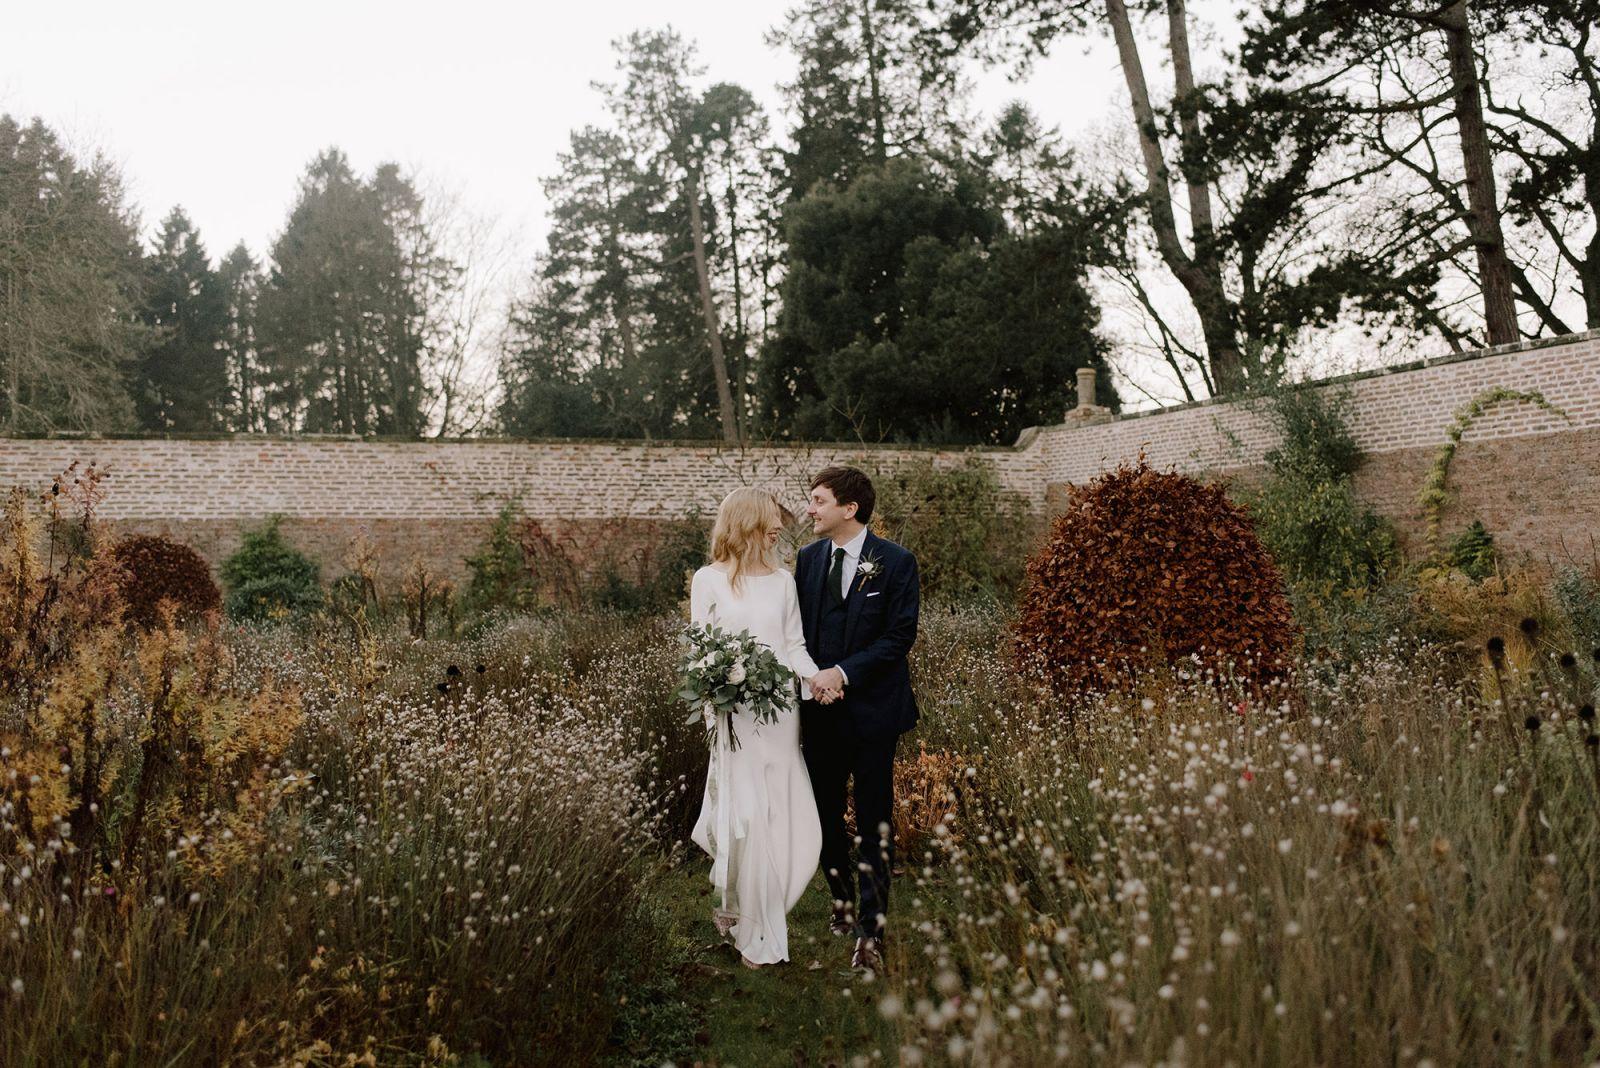 Yorkshire Wedding Photography romantic moments